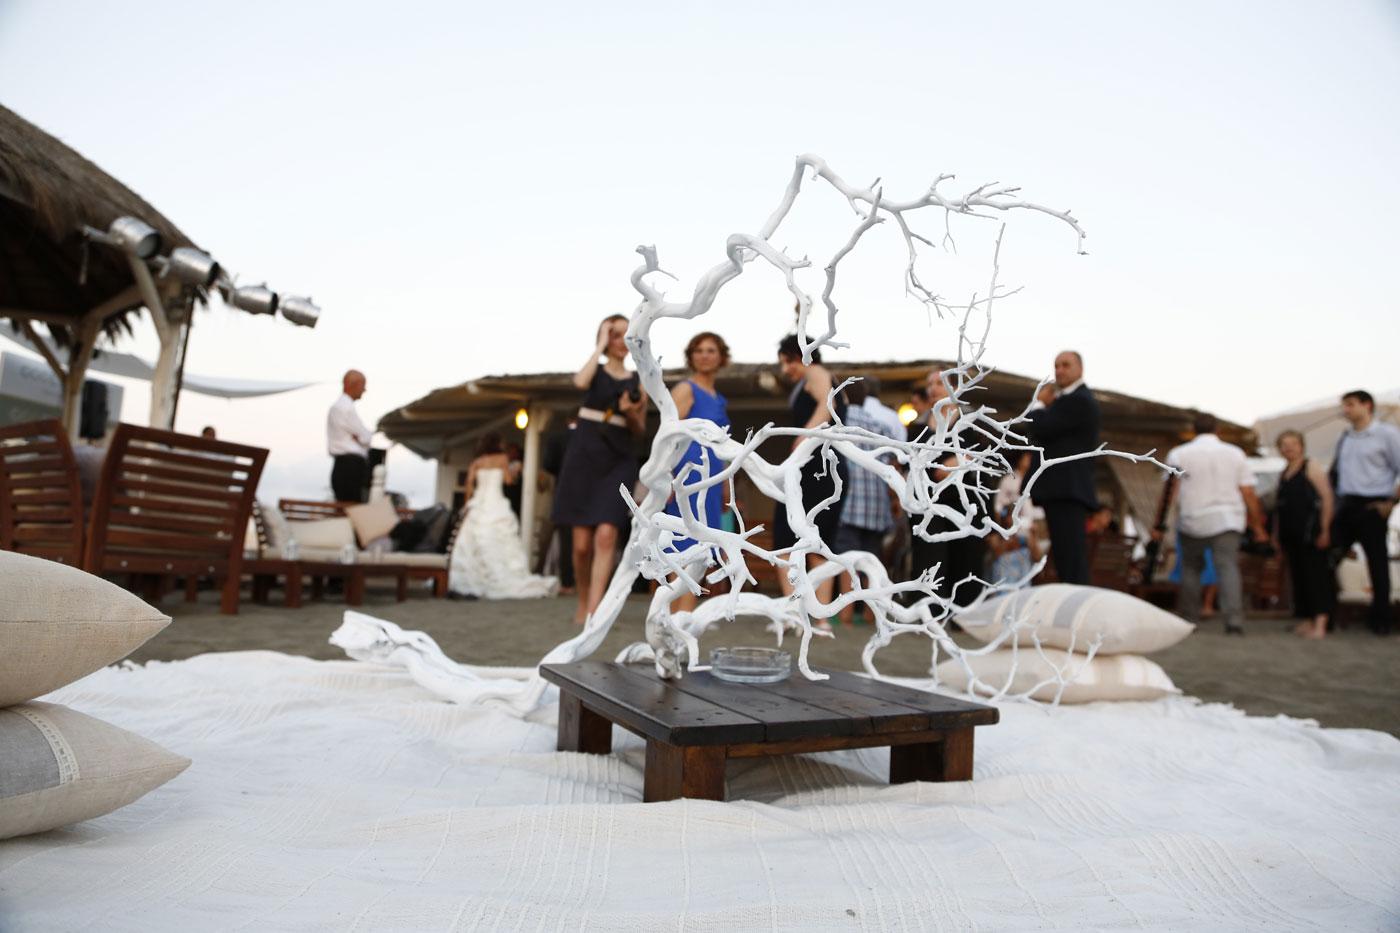 Matrimonio In Spiaggia Roma : Matrimonio sulla spiaggia roma anita galafate wedding planner